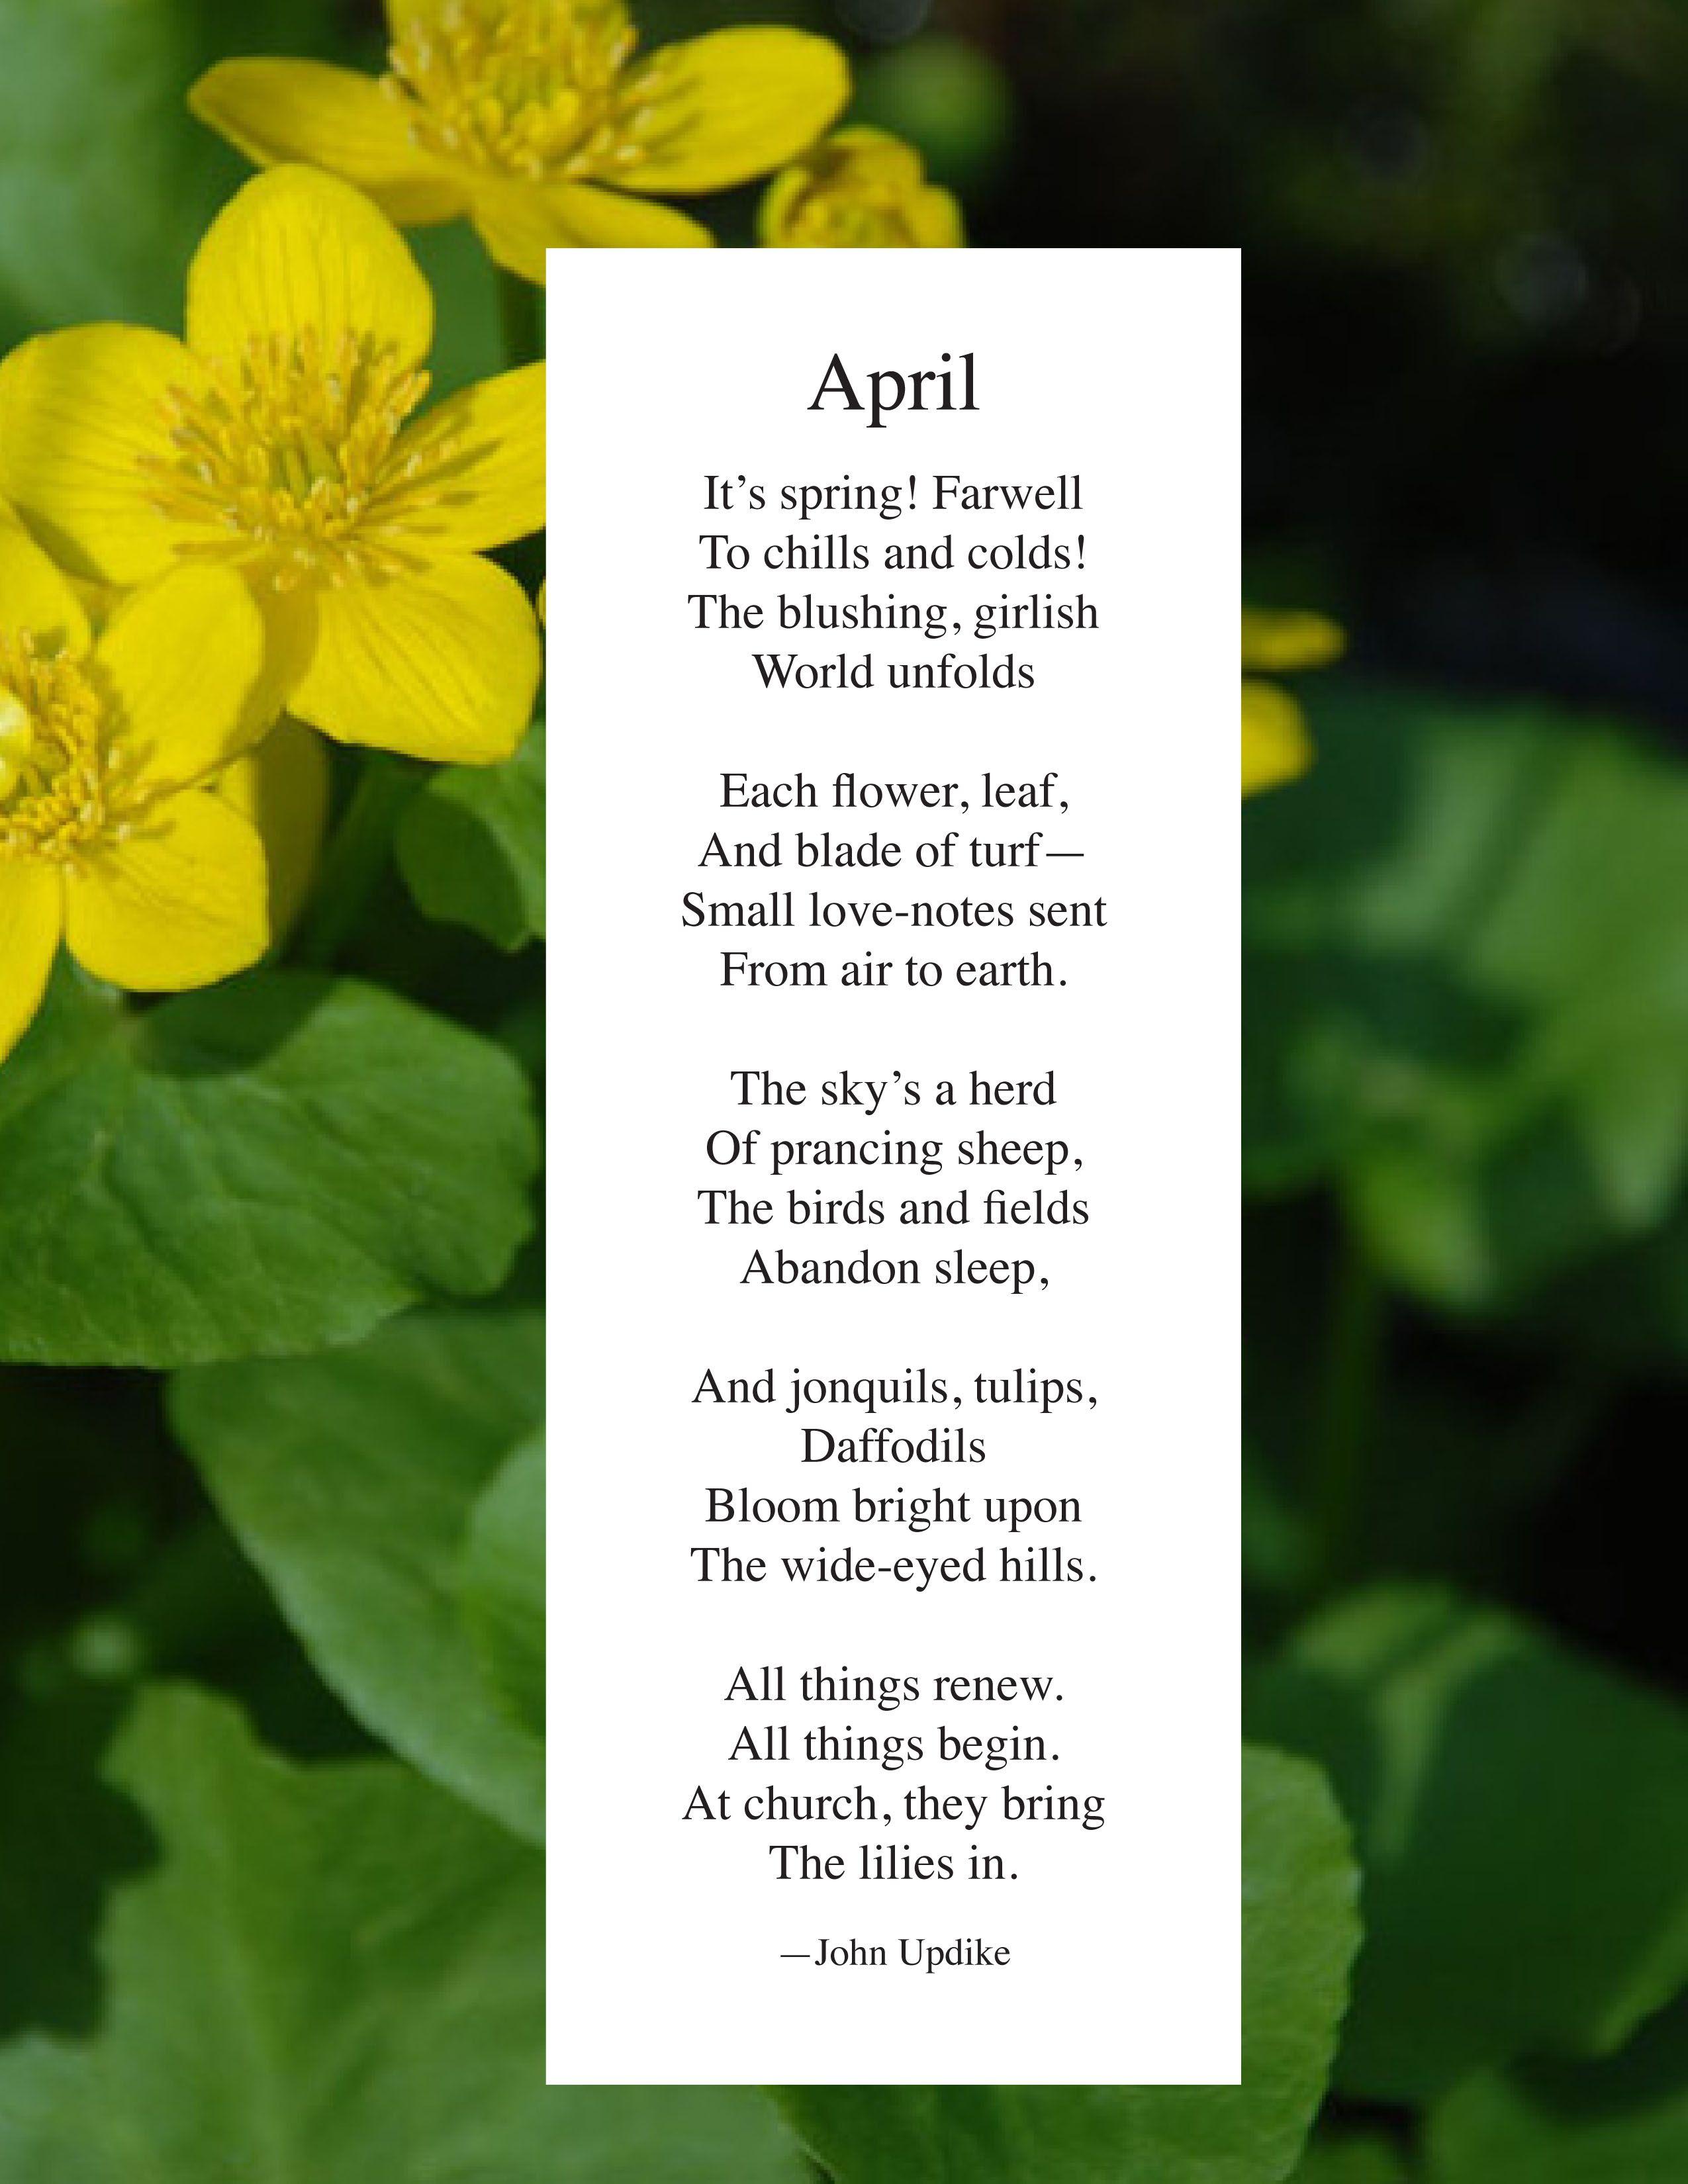 John Updike | April | April poems, Poems, Childrens poems